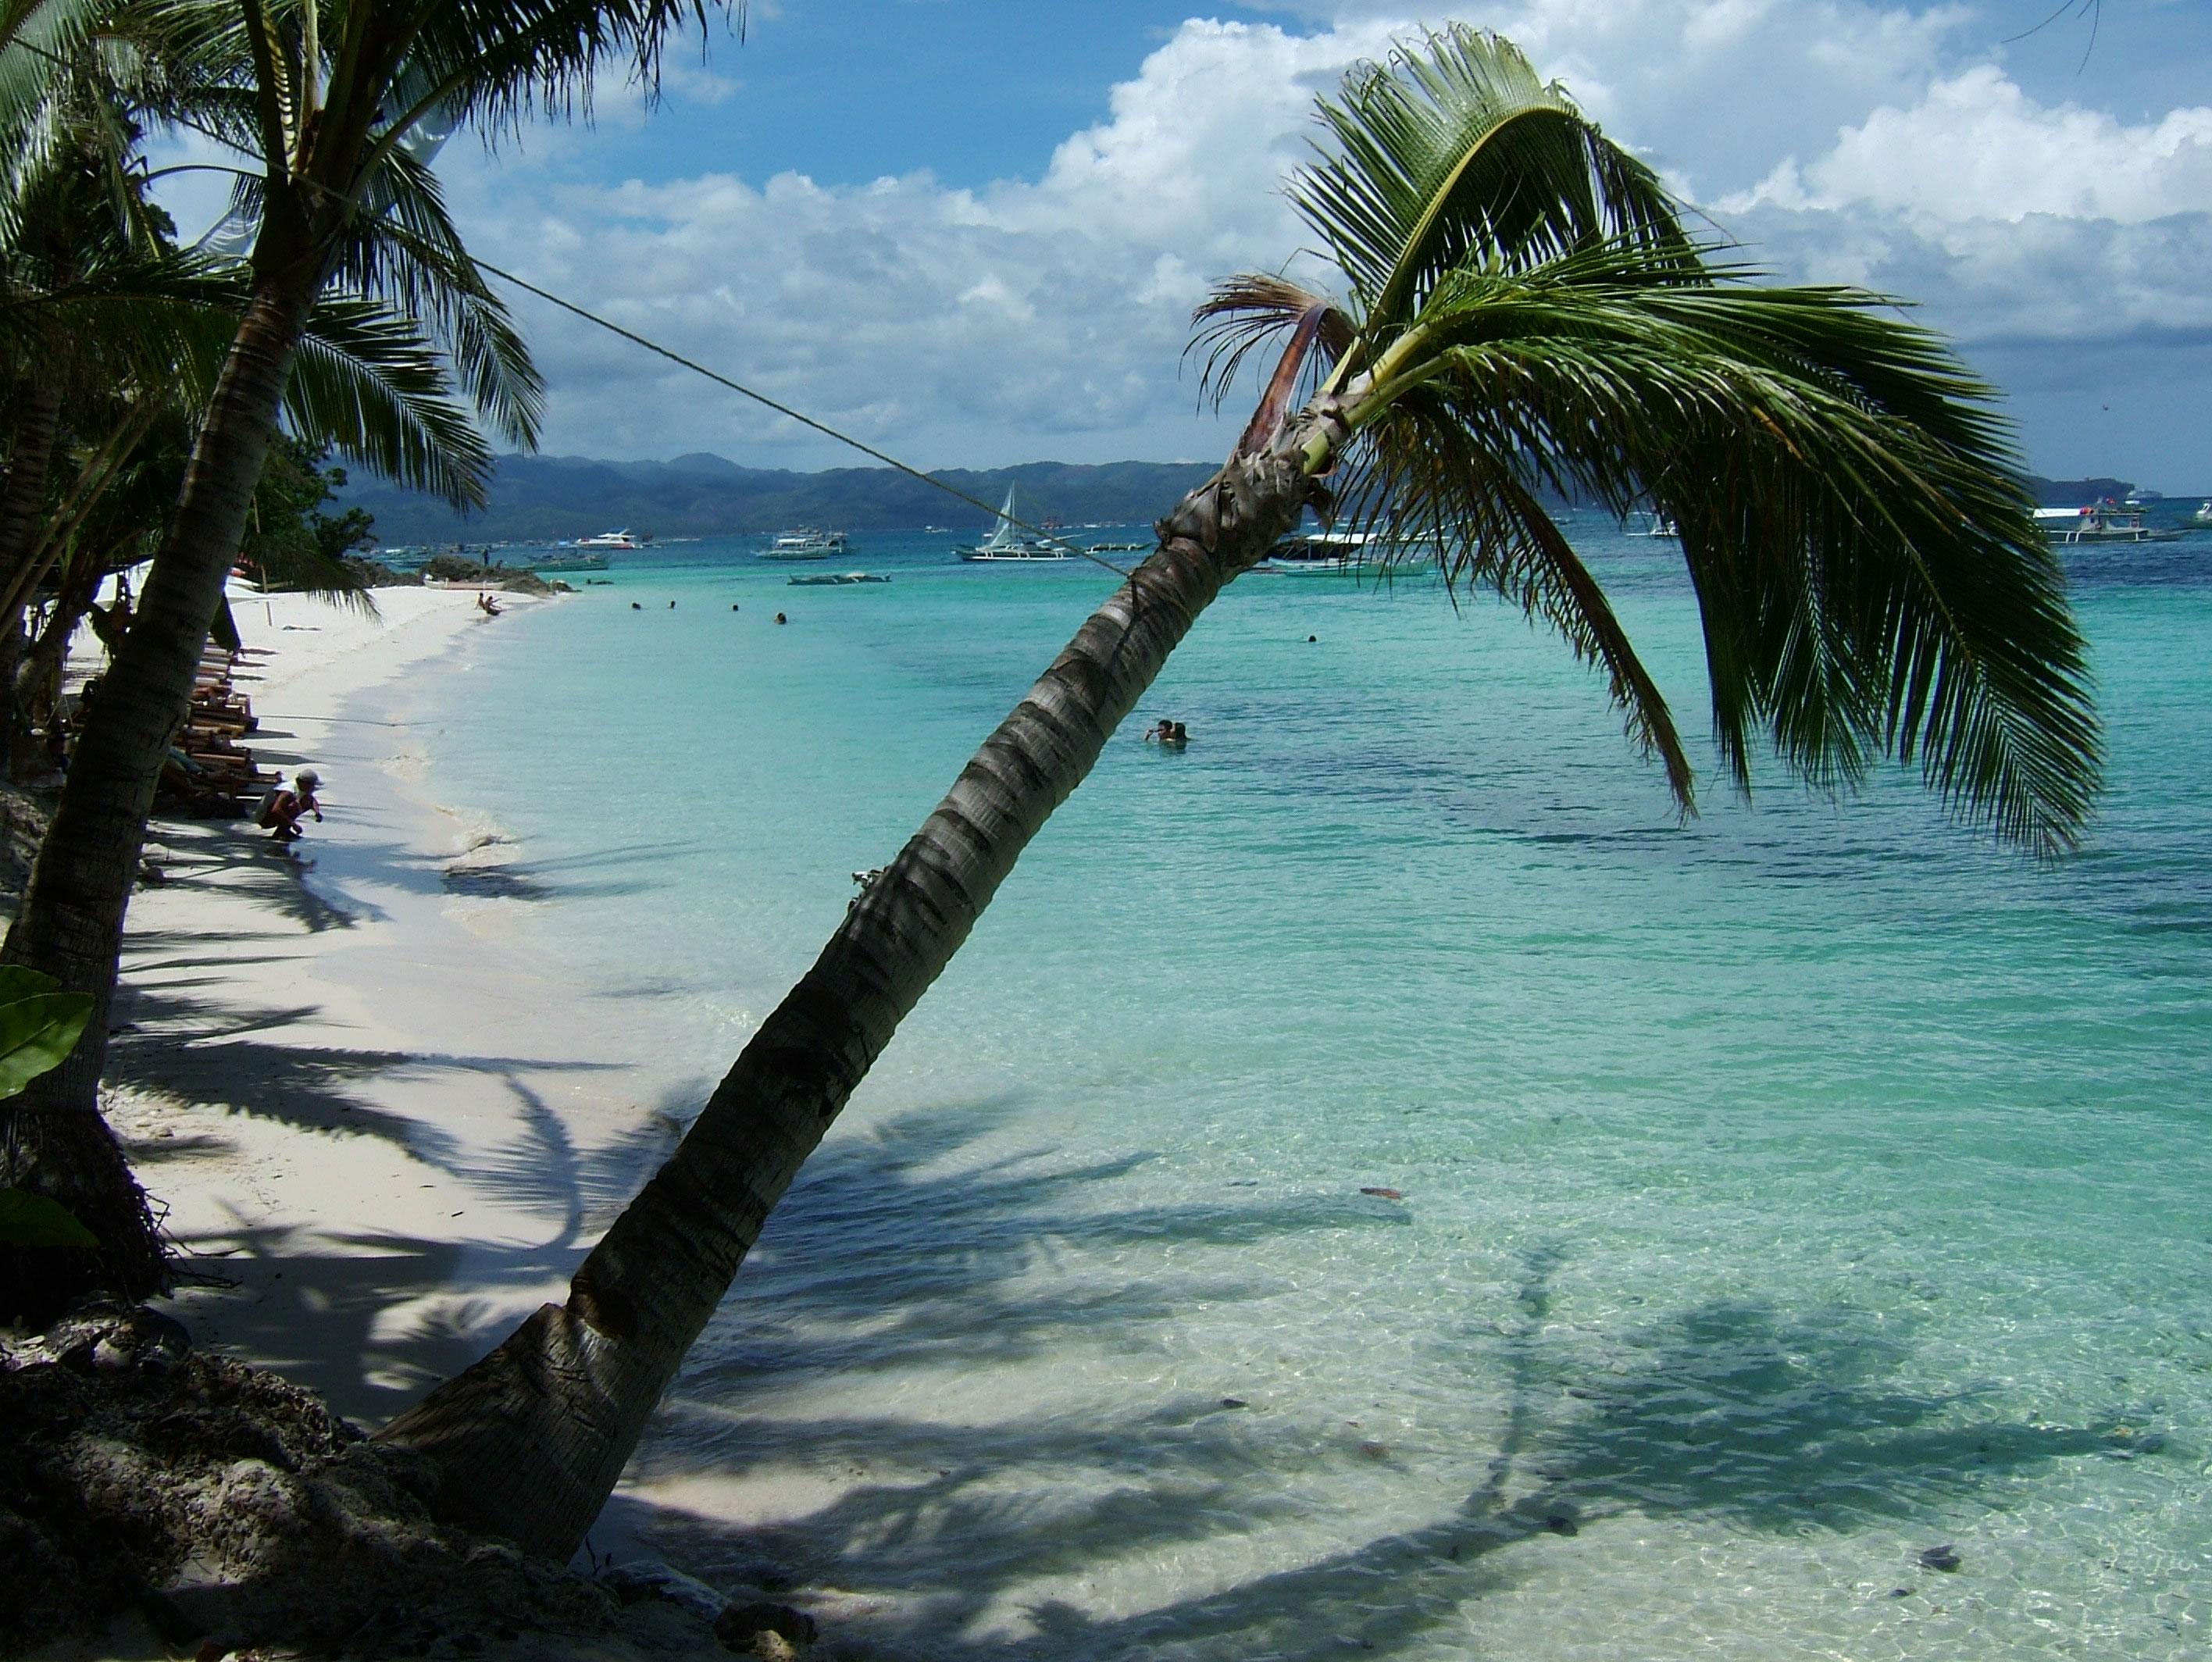 Philippines Sugar Islands Boracay Punta bunga beach Resorts 2007 09